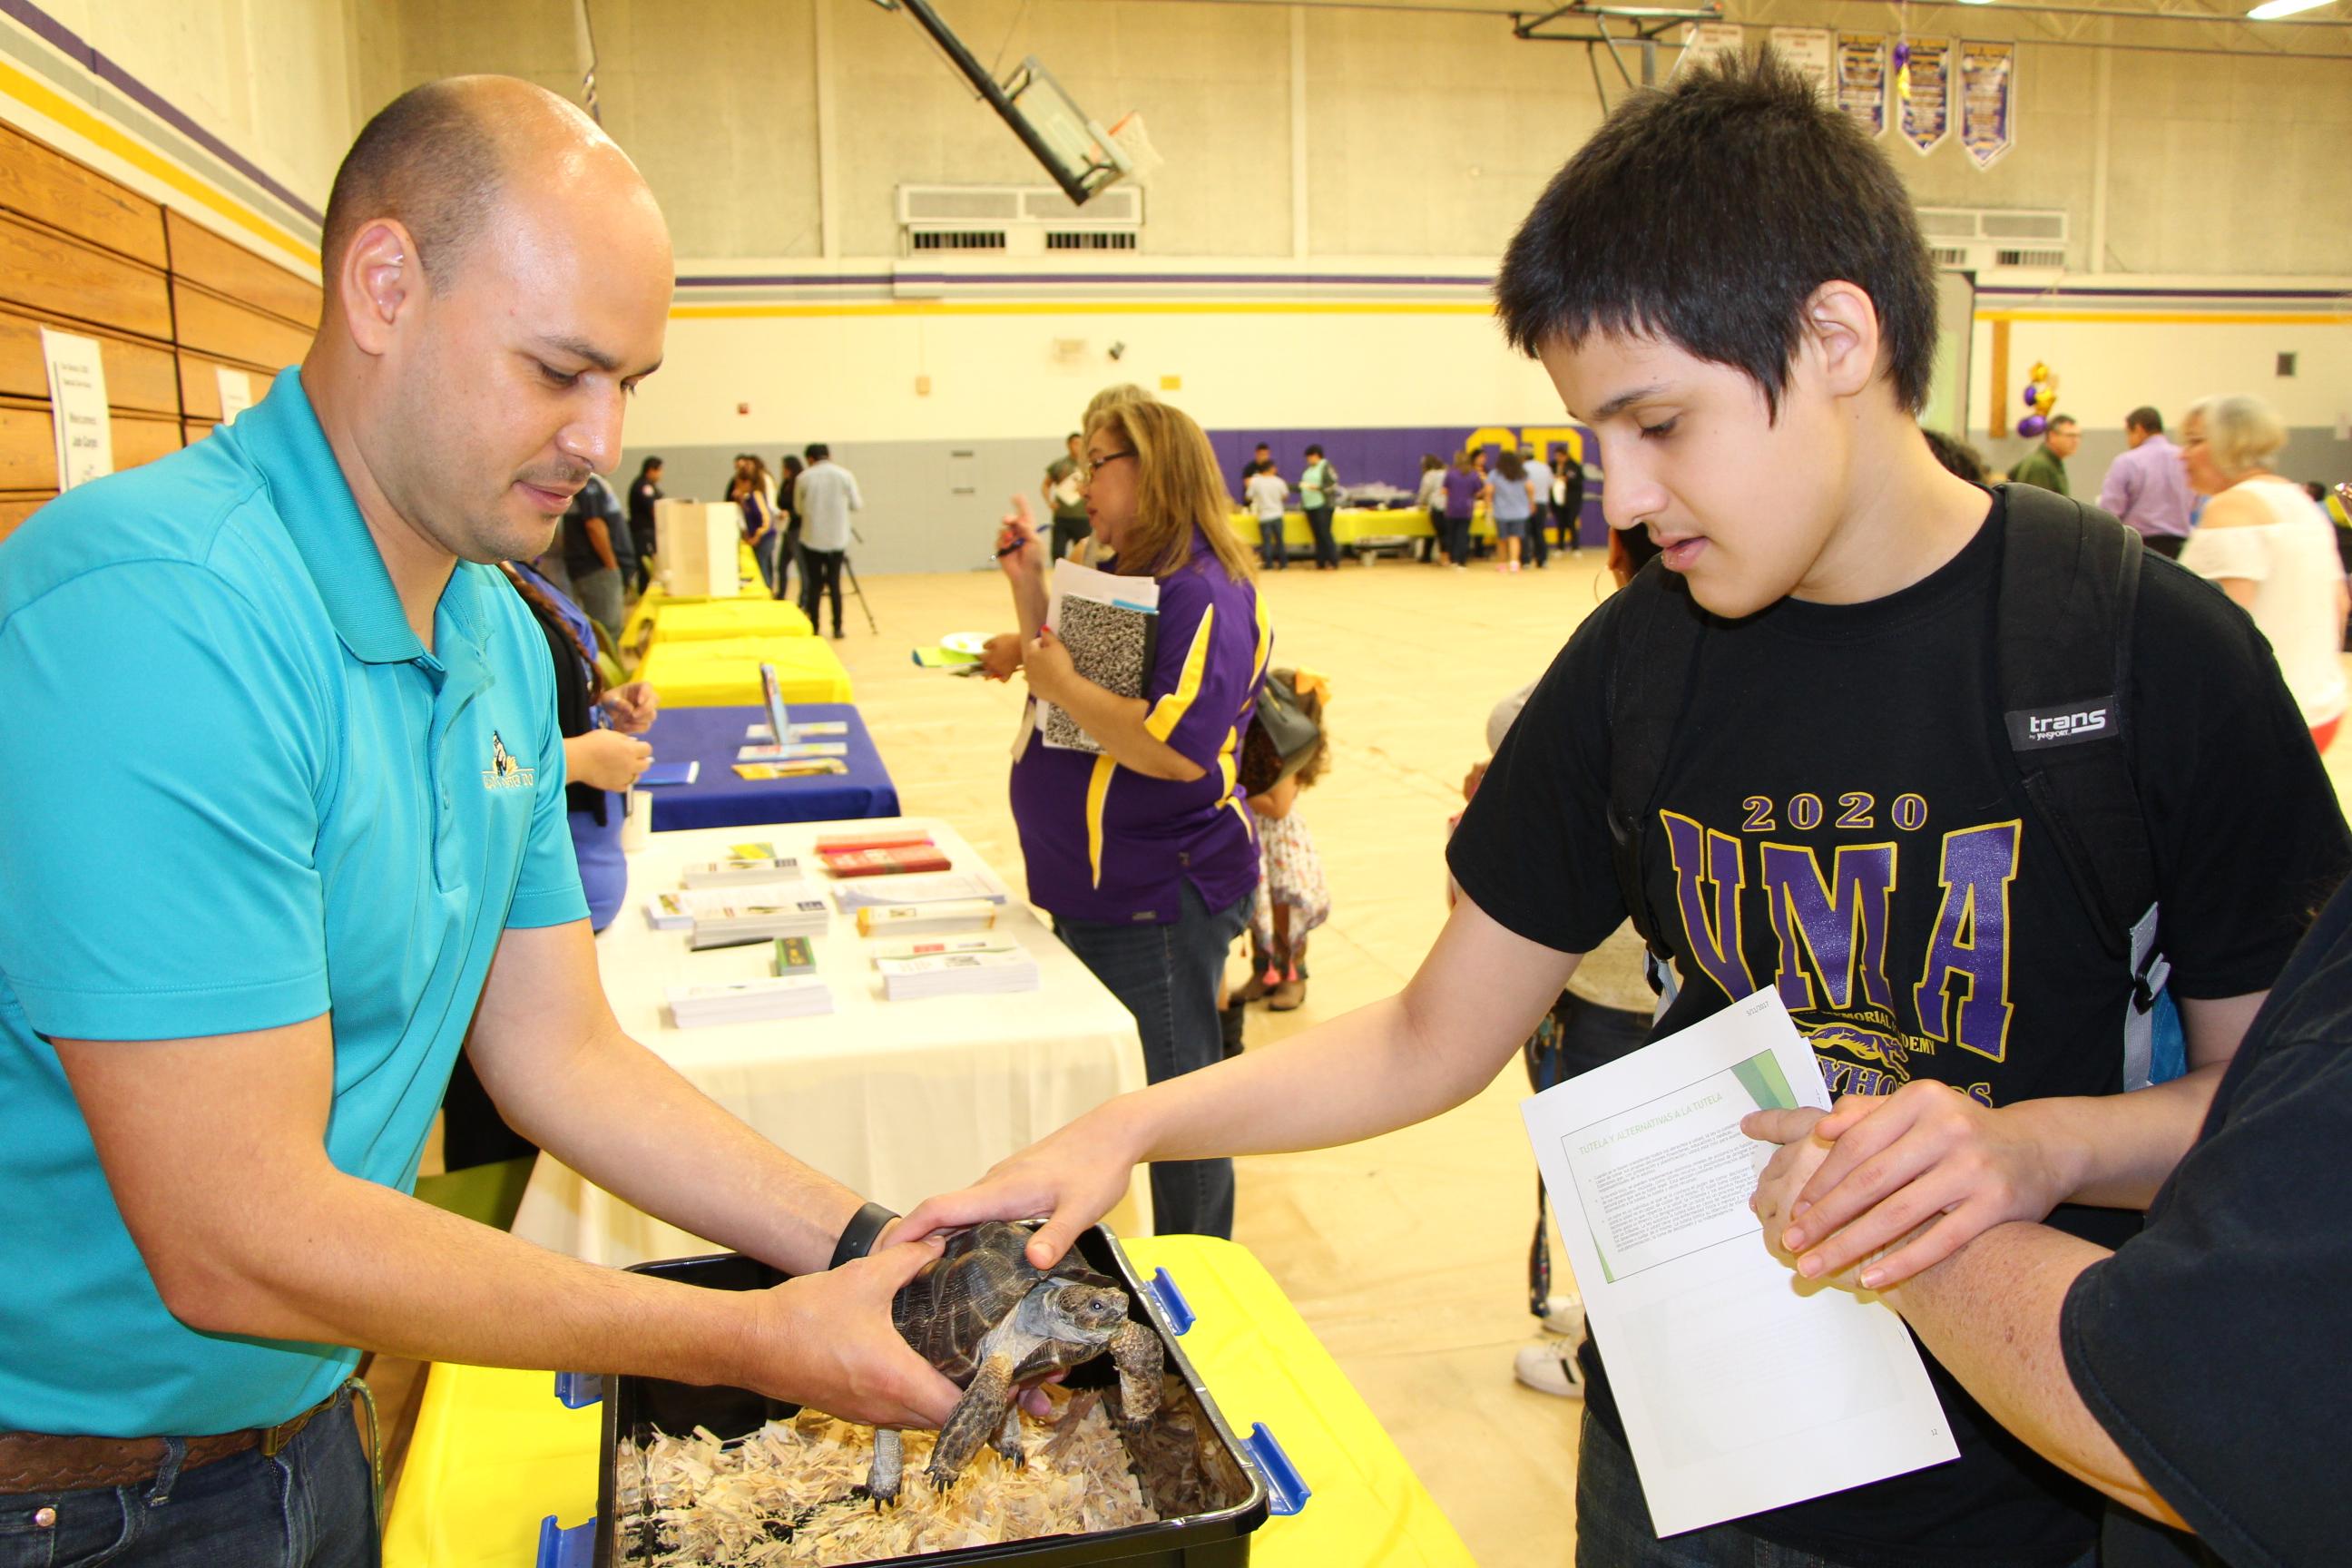 District Helps Students Explore Post Secondary Goals San